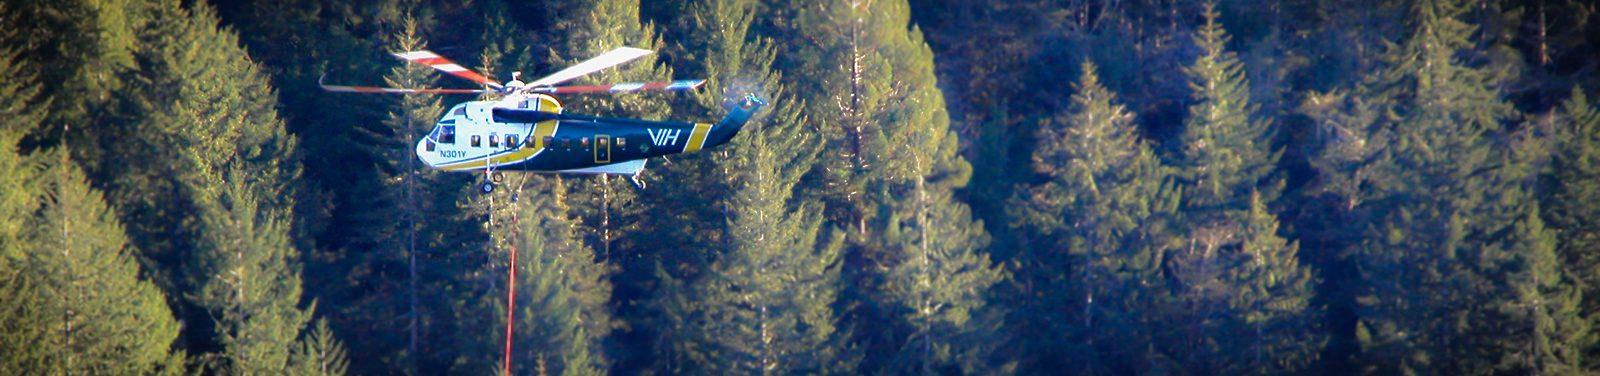 Kawak Aviaiton Sikorsky S61 Auxiliary Hydraulic System